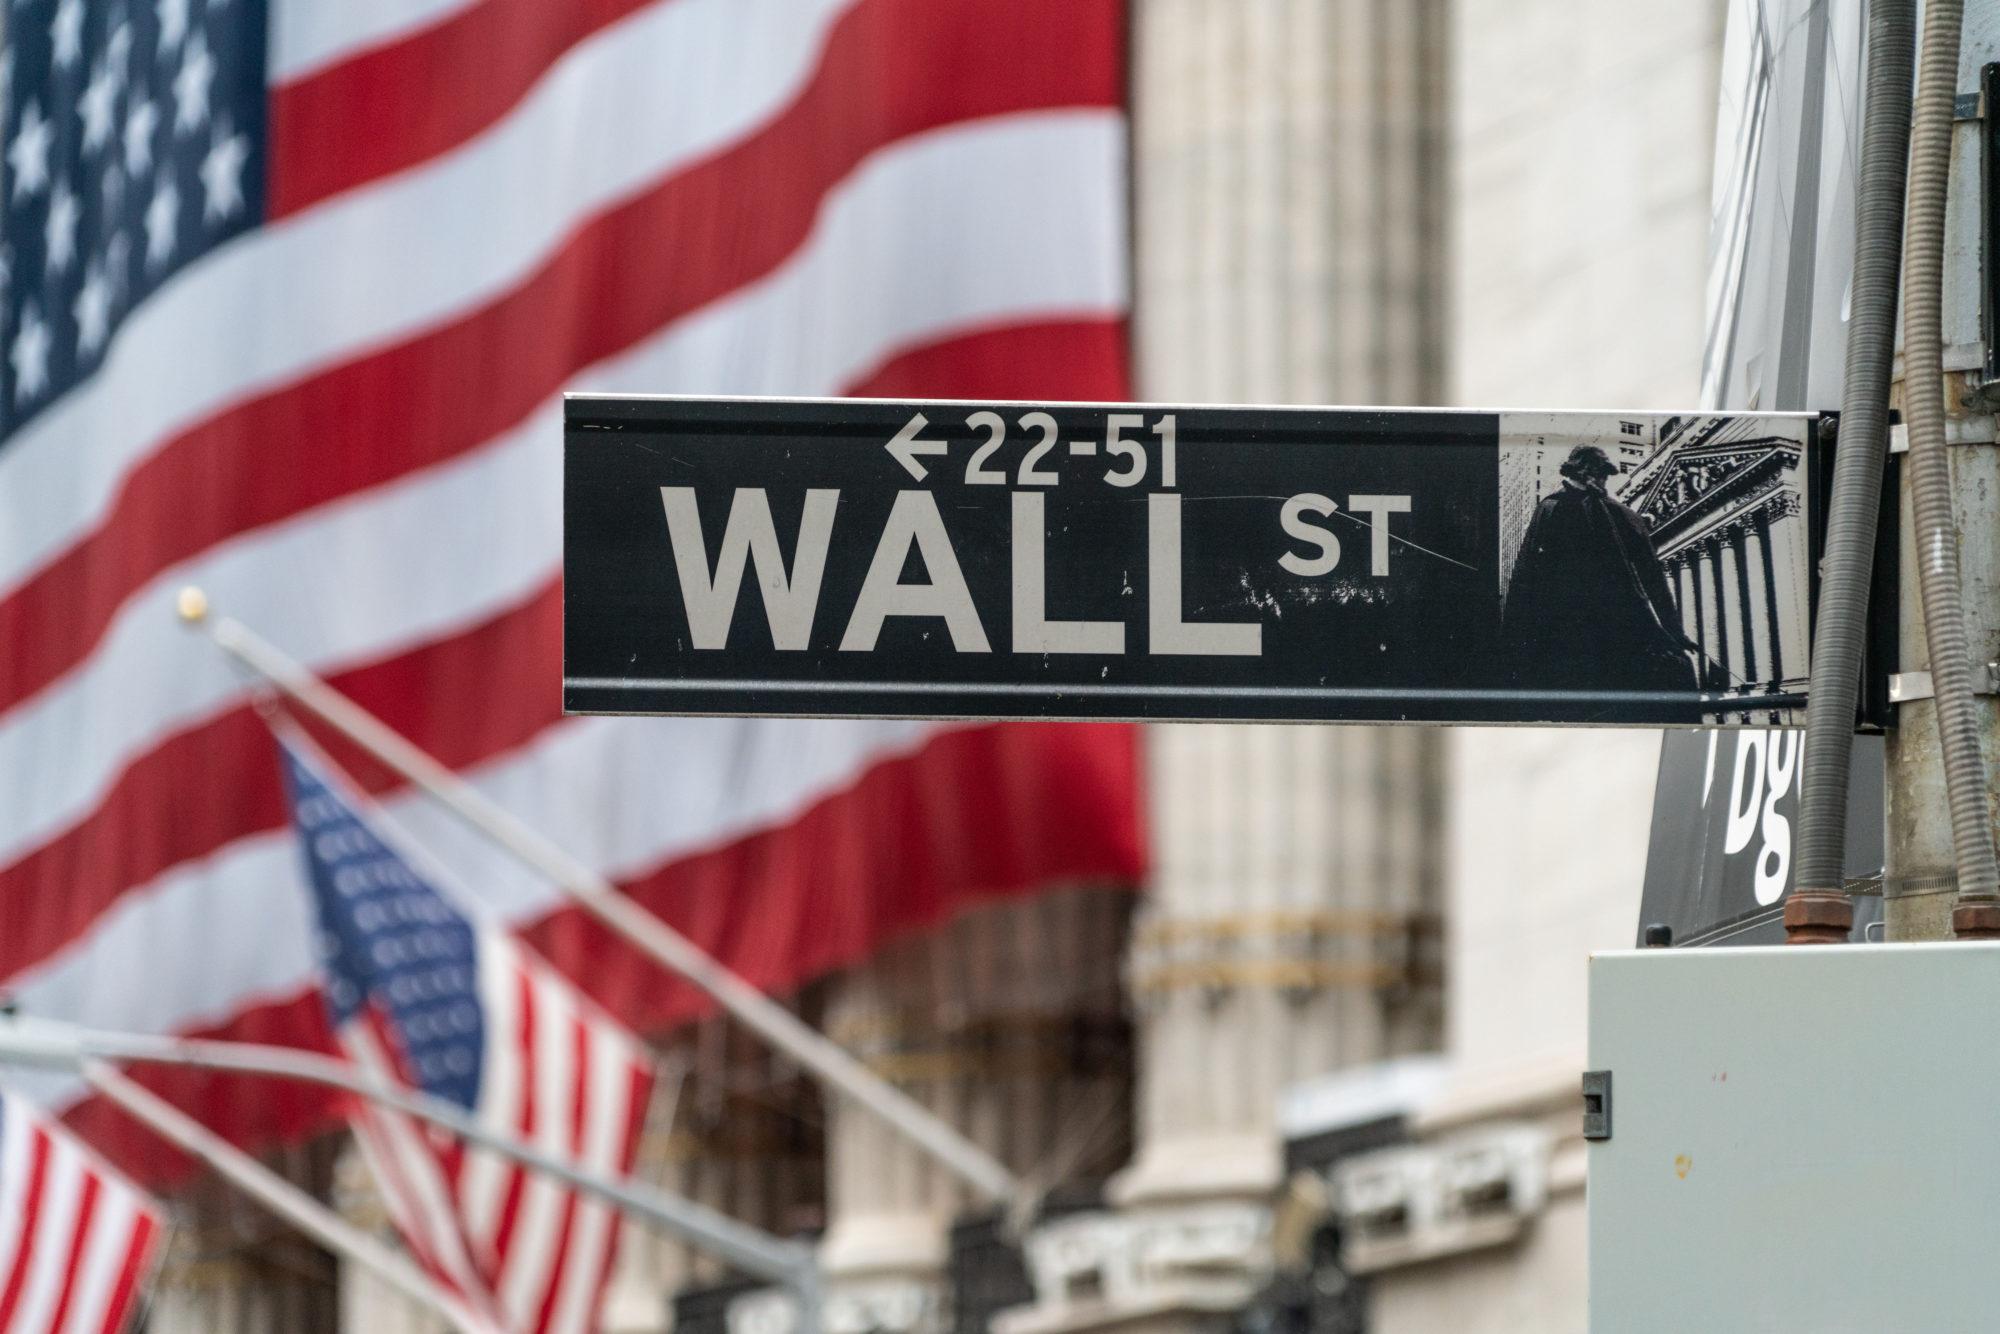 UK Budget / Wall Street CEOs talk coronavirus at White House / G4S posts financial results